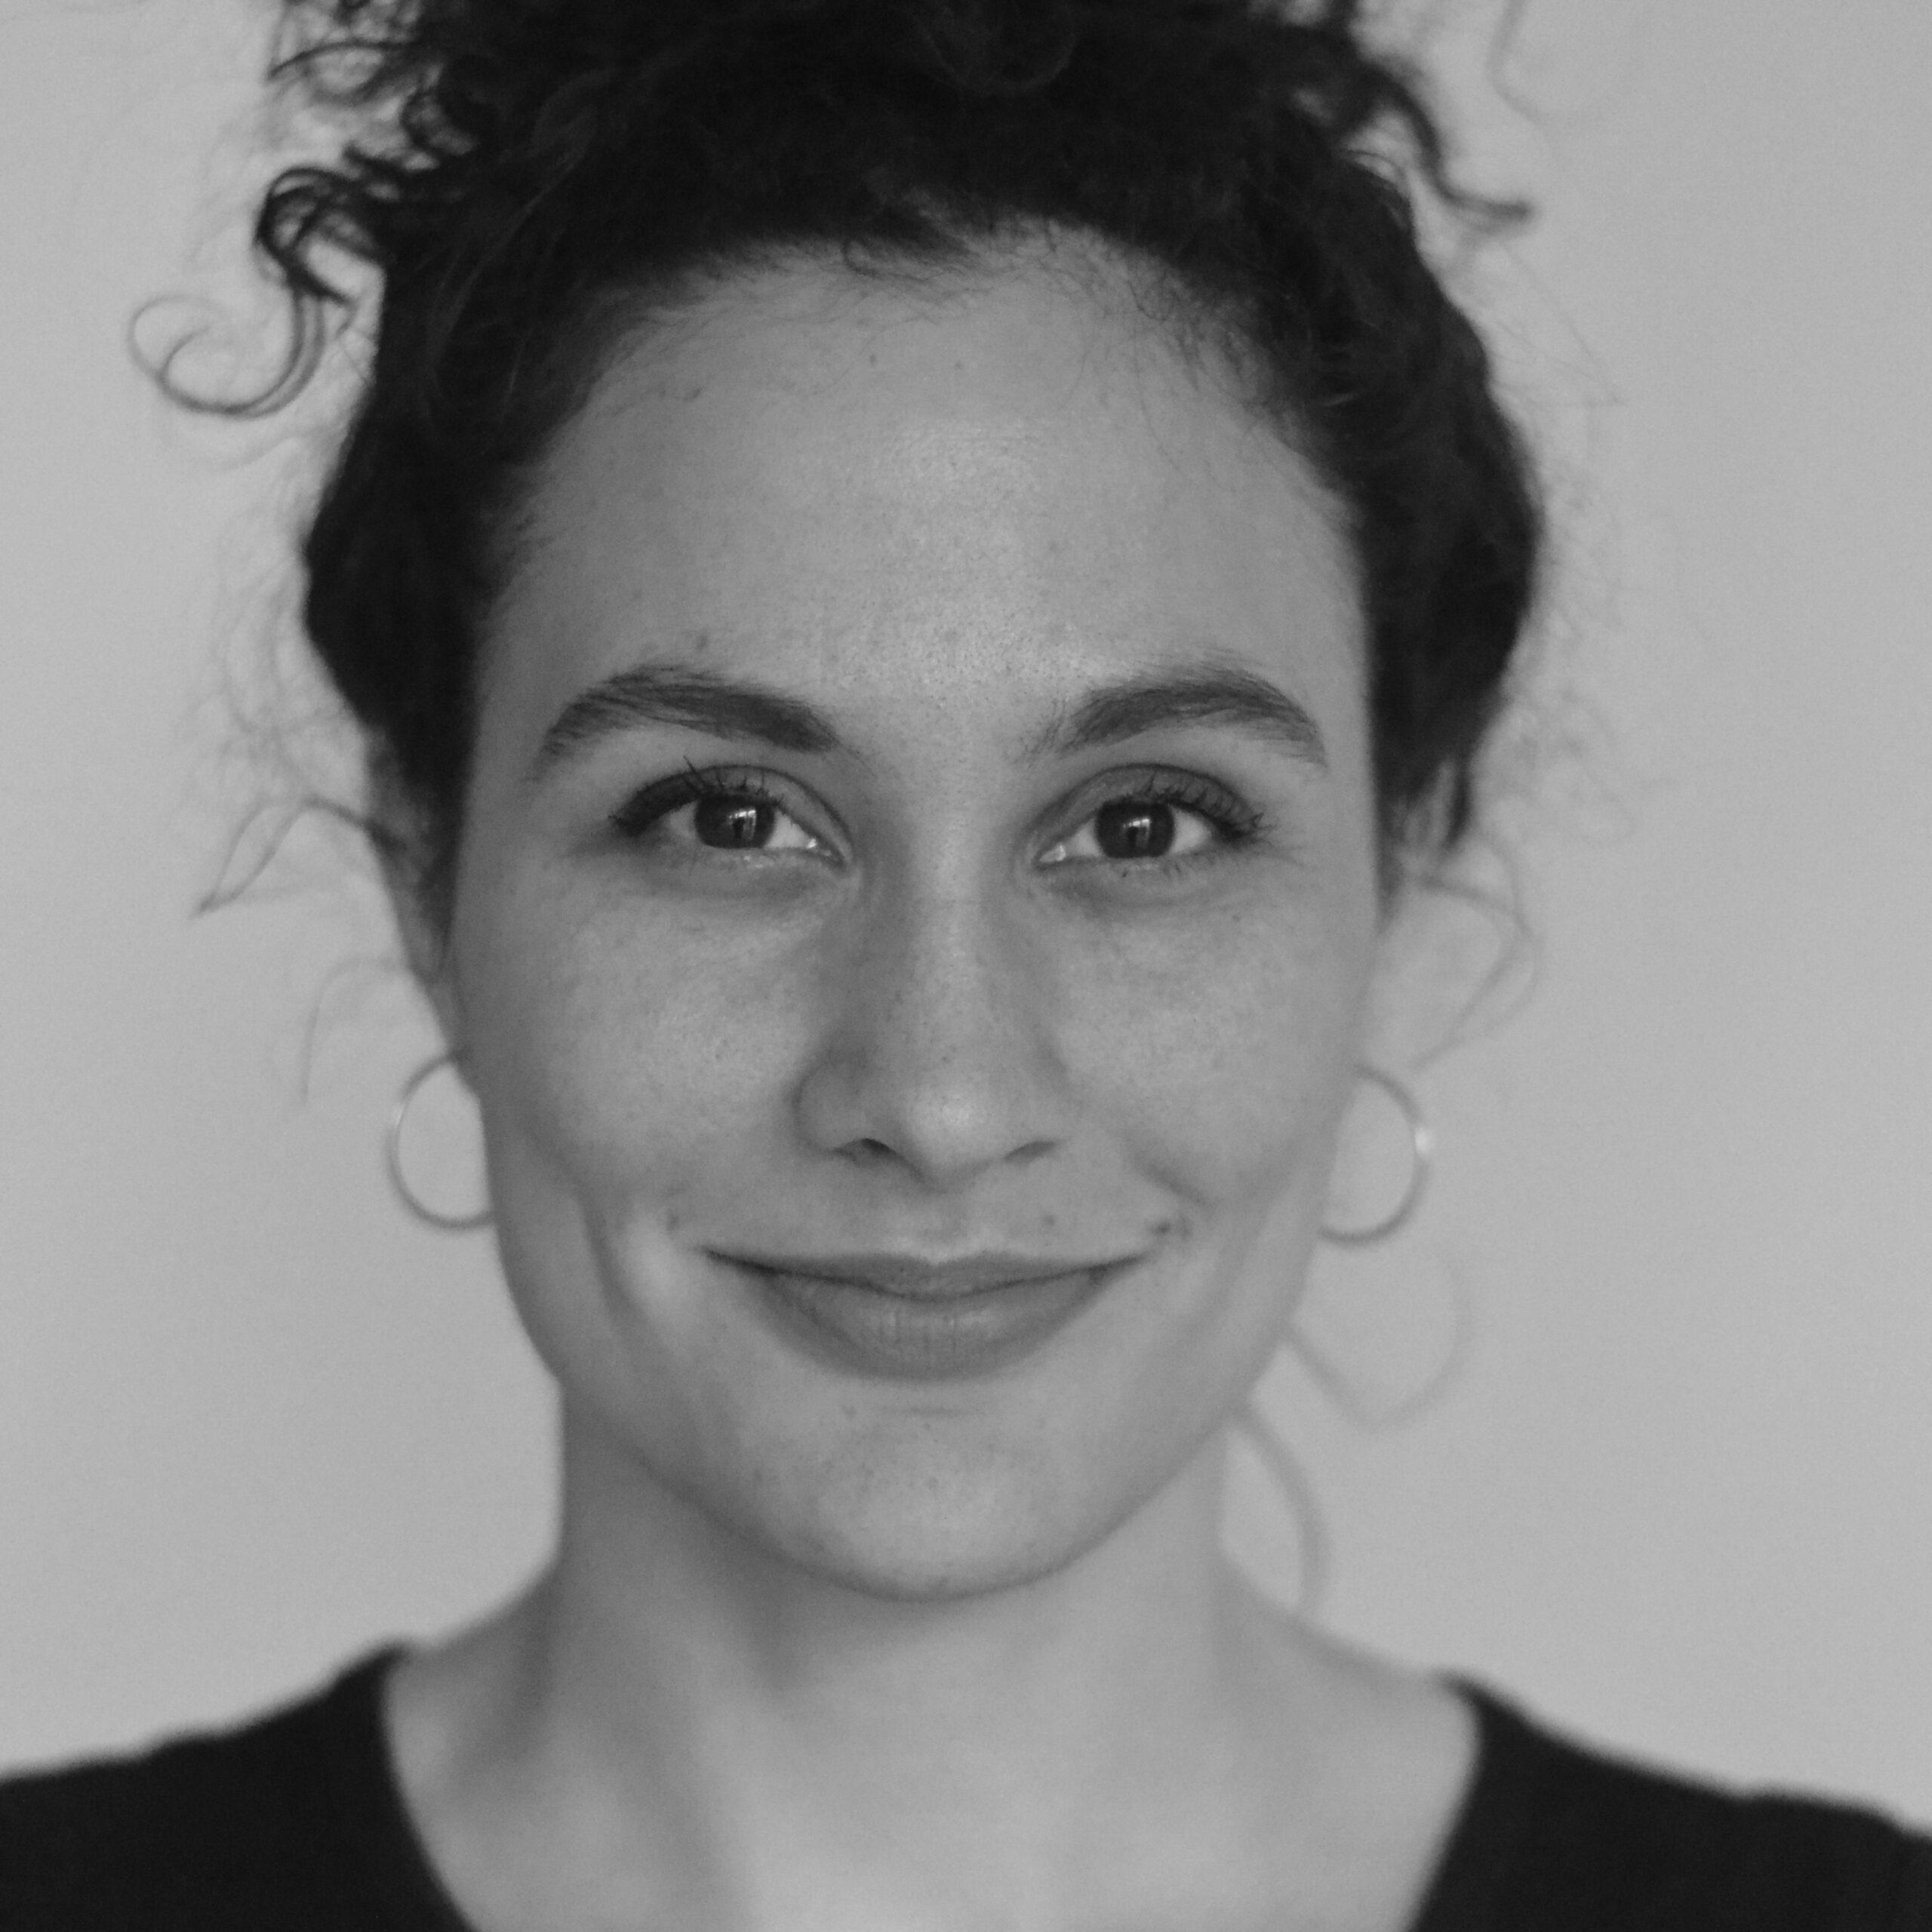 Camille Lescarbeau